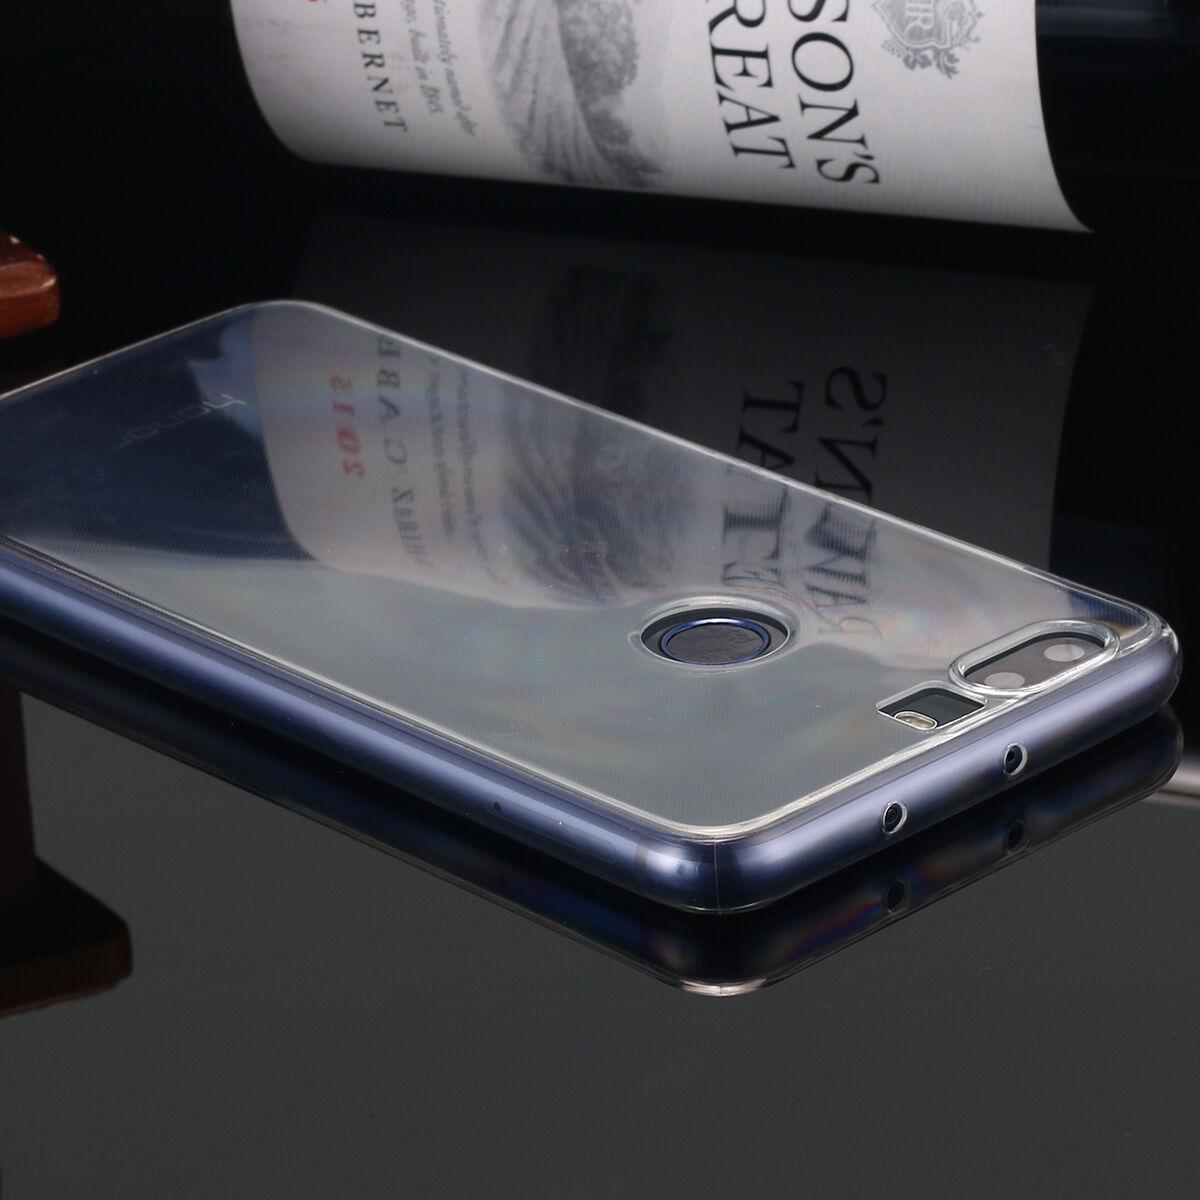 Samsung phone case samsung galaxy note 2 : ... Honor 8 Ultra Slim Thin TPU Transparent Case Clear Cover Soft Skin